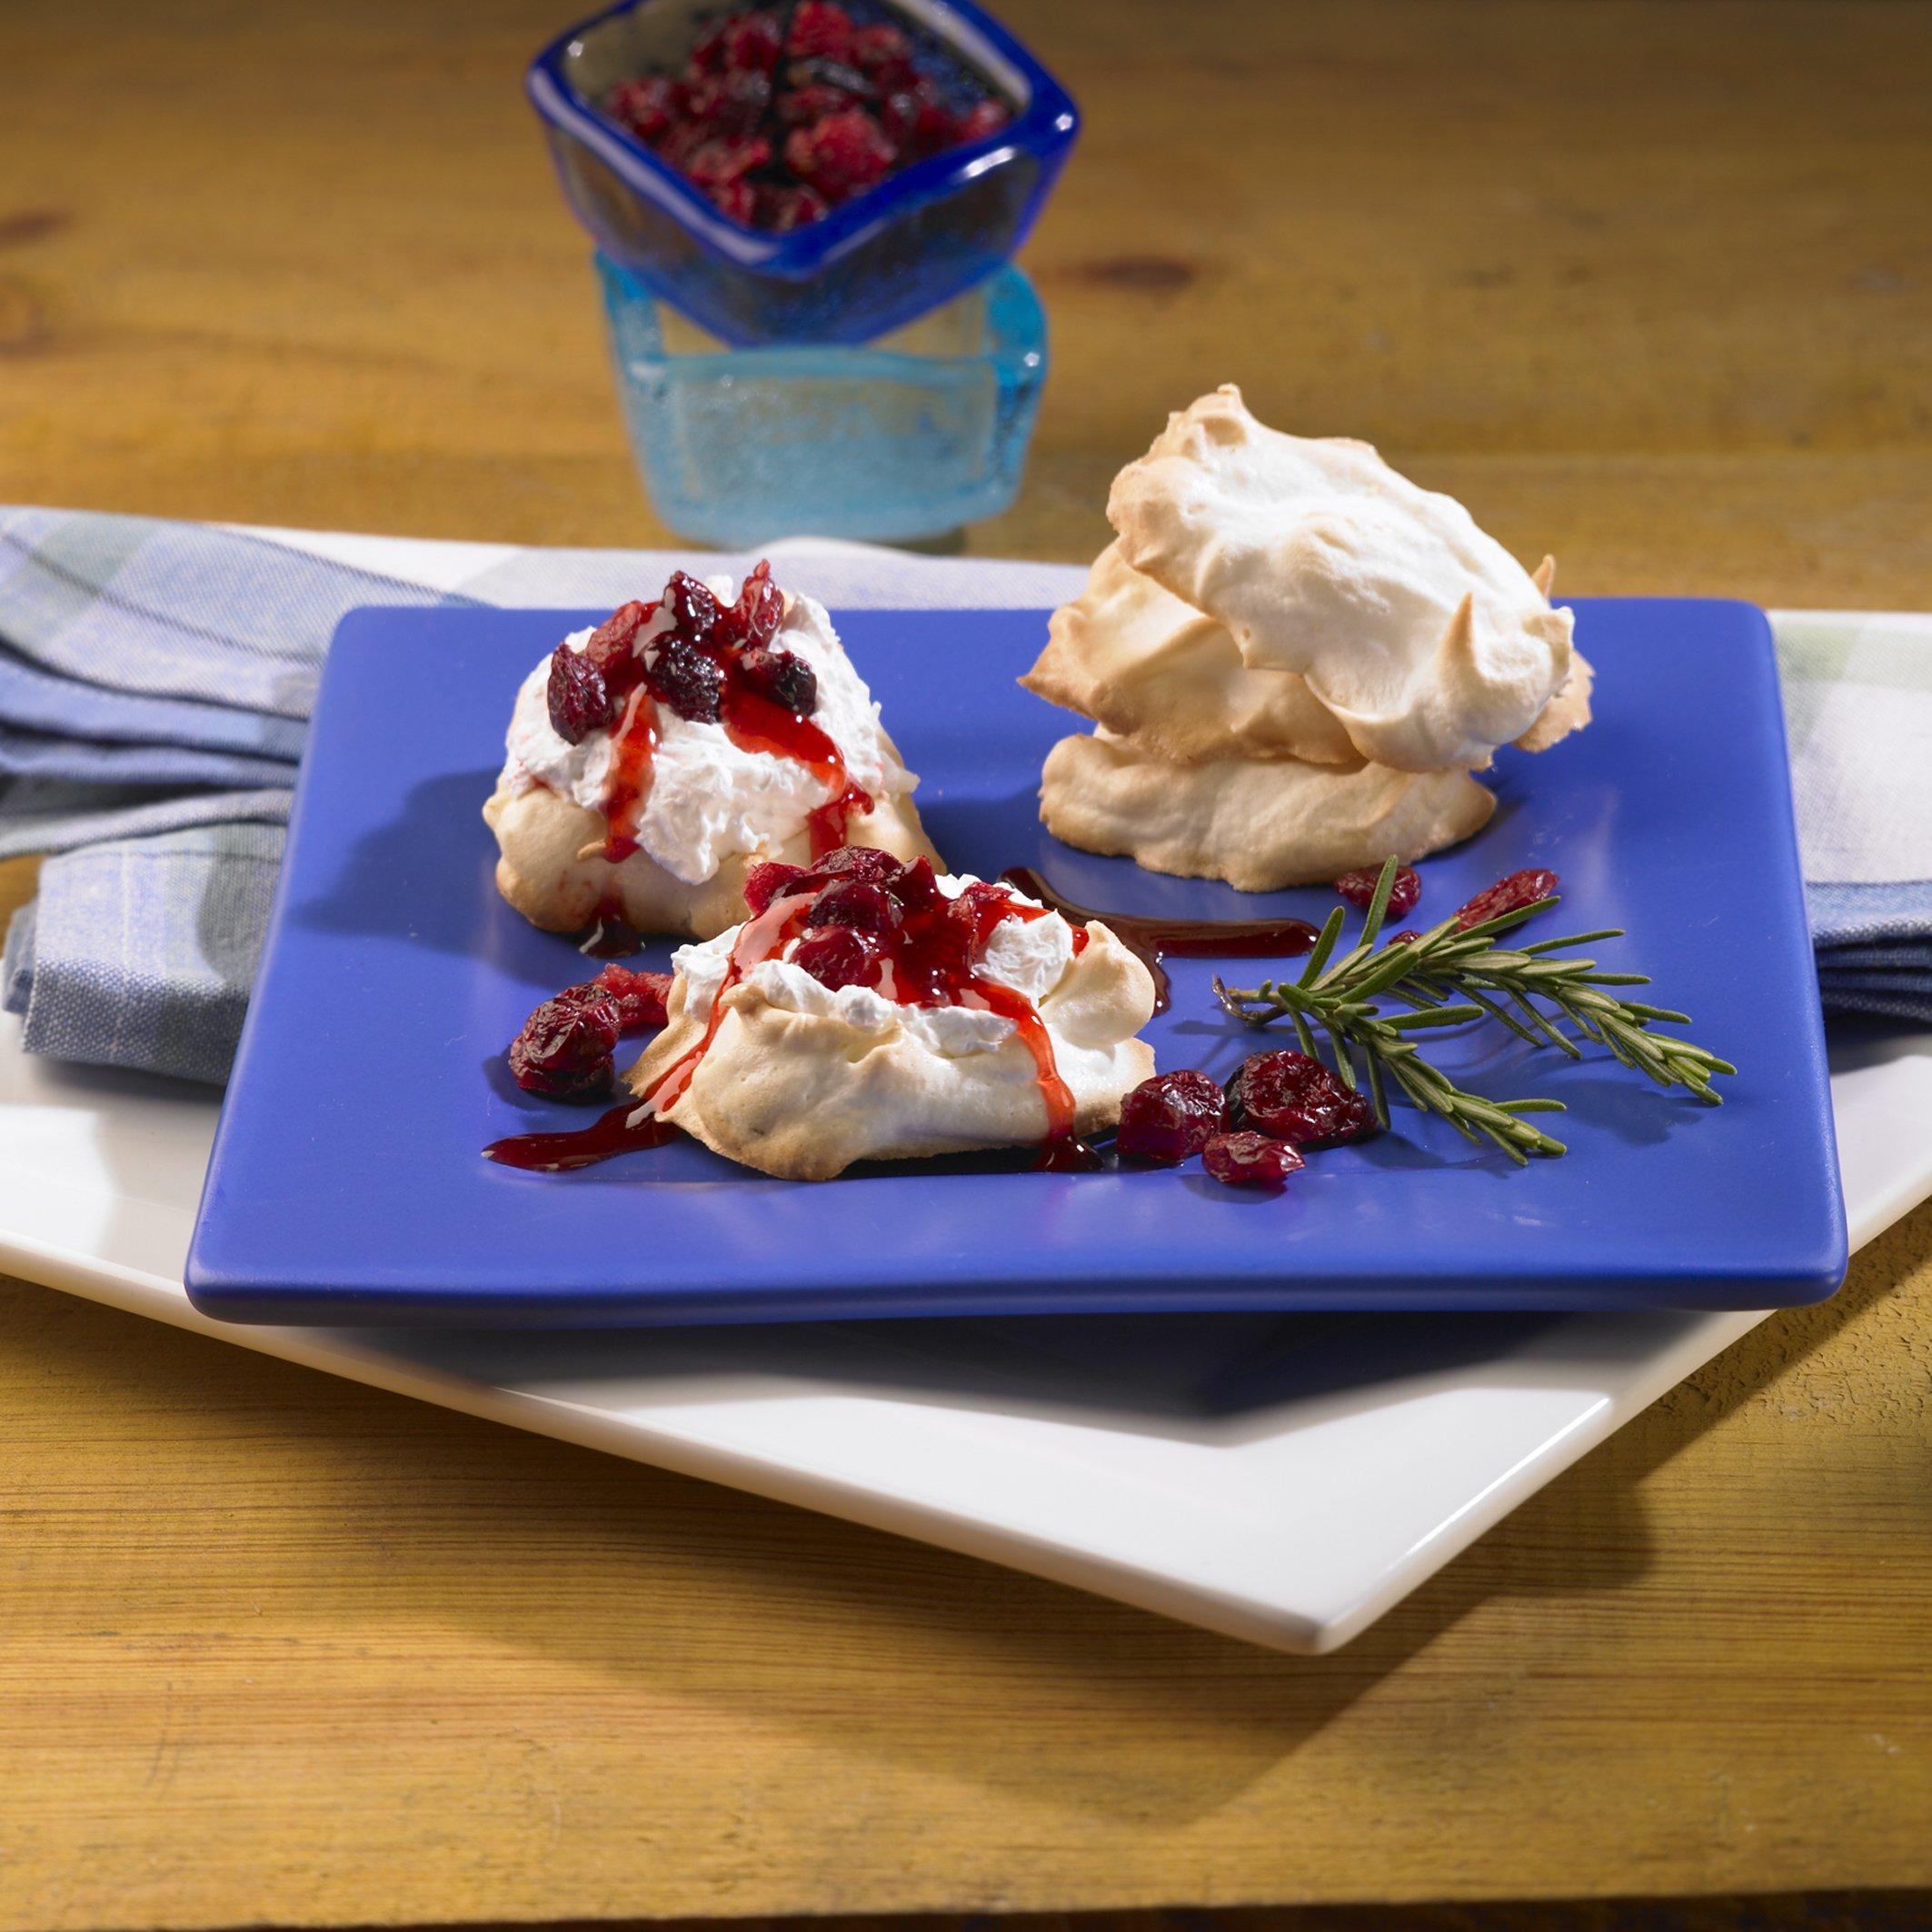 Cranberry Cream and Lemon Meringue